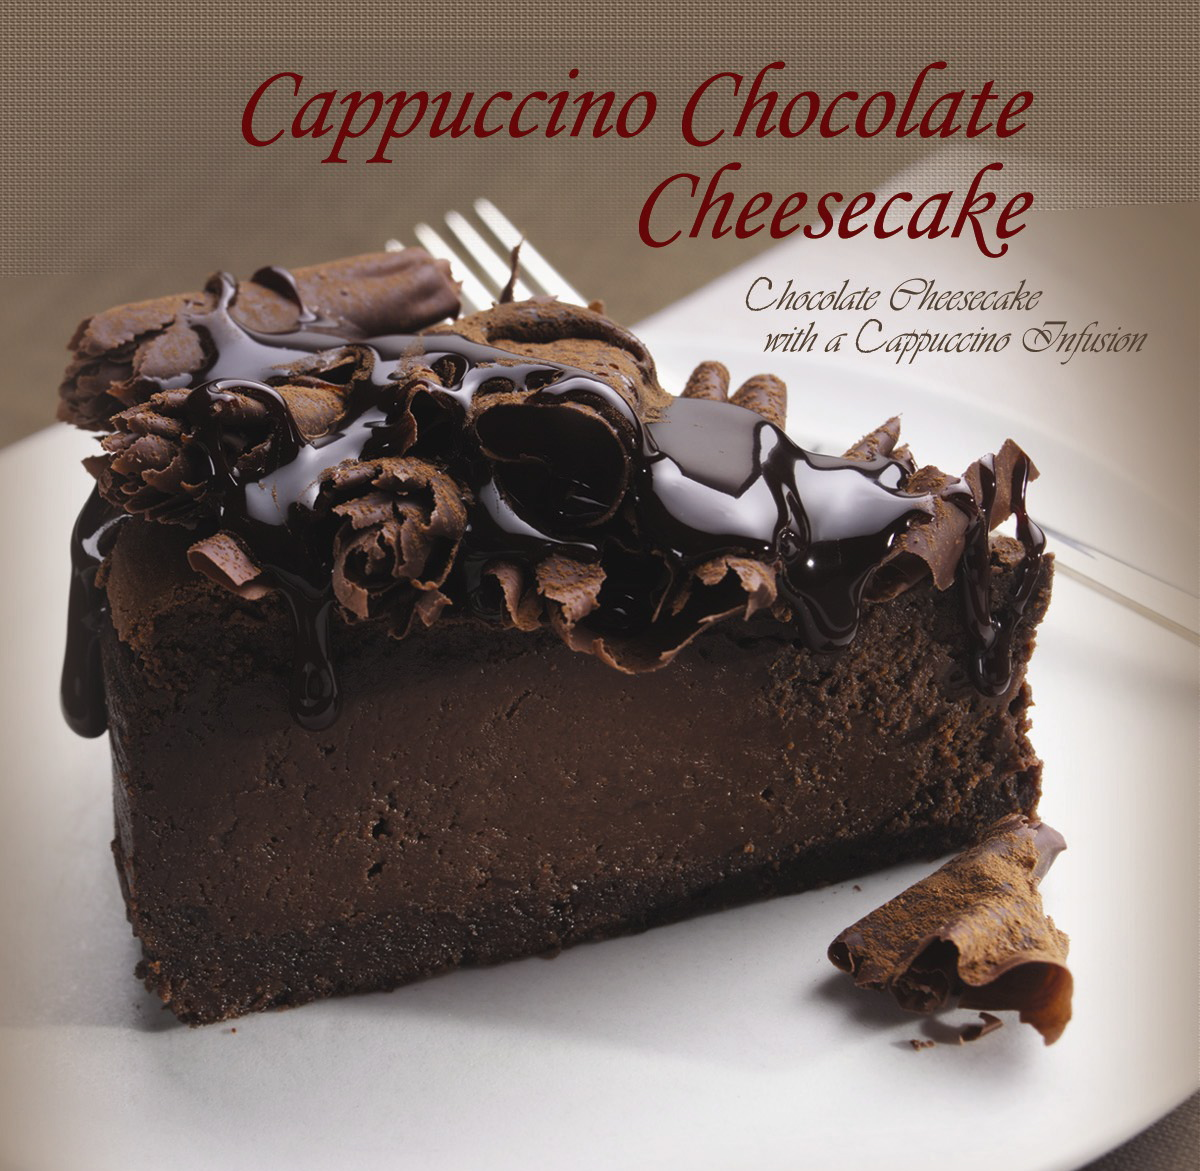 cheesecake cappuccino fudge cheesecake cappuccino chocolate cupcakes ...